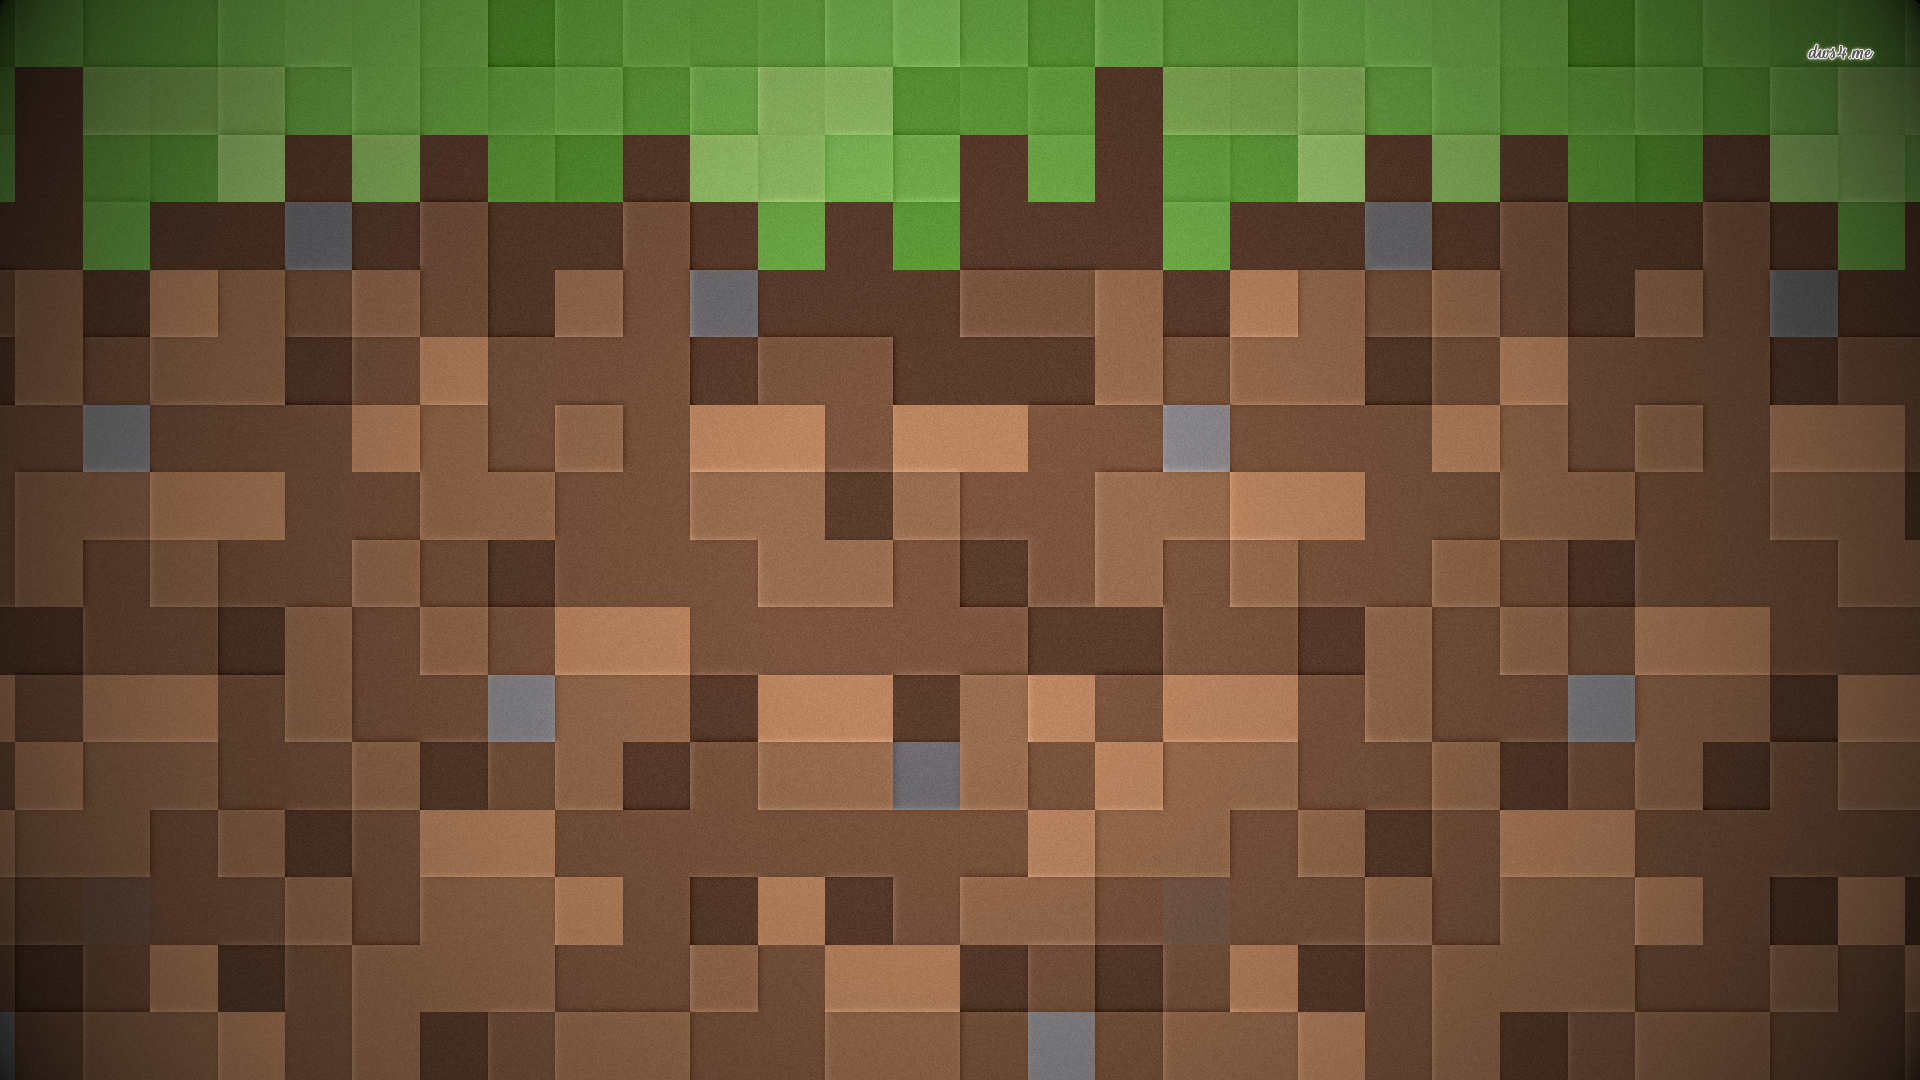 1920x1080 Minecraft Pattern Wallpaper